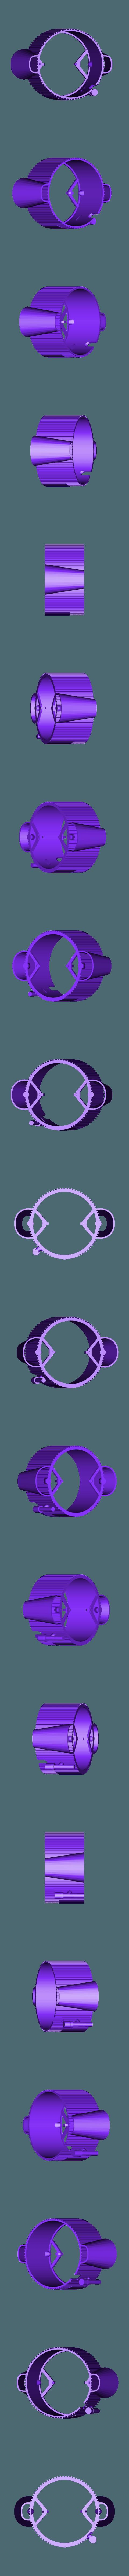 17 silver.stl Download free STL file mercury atlas MA6 friendship 7 • 3D print object, theamphioxus